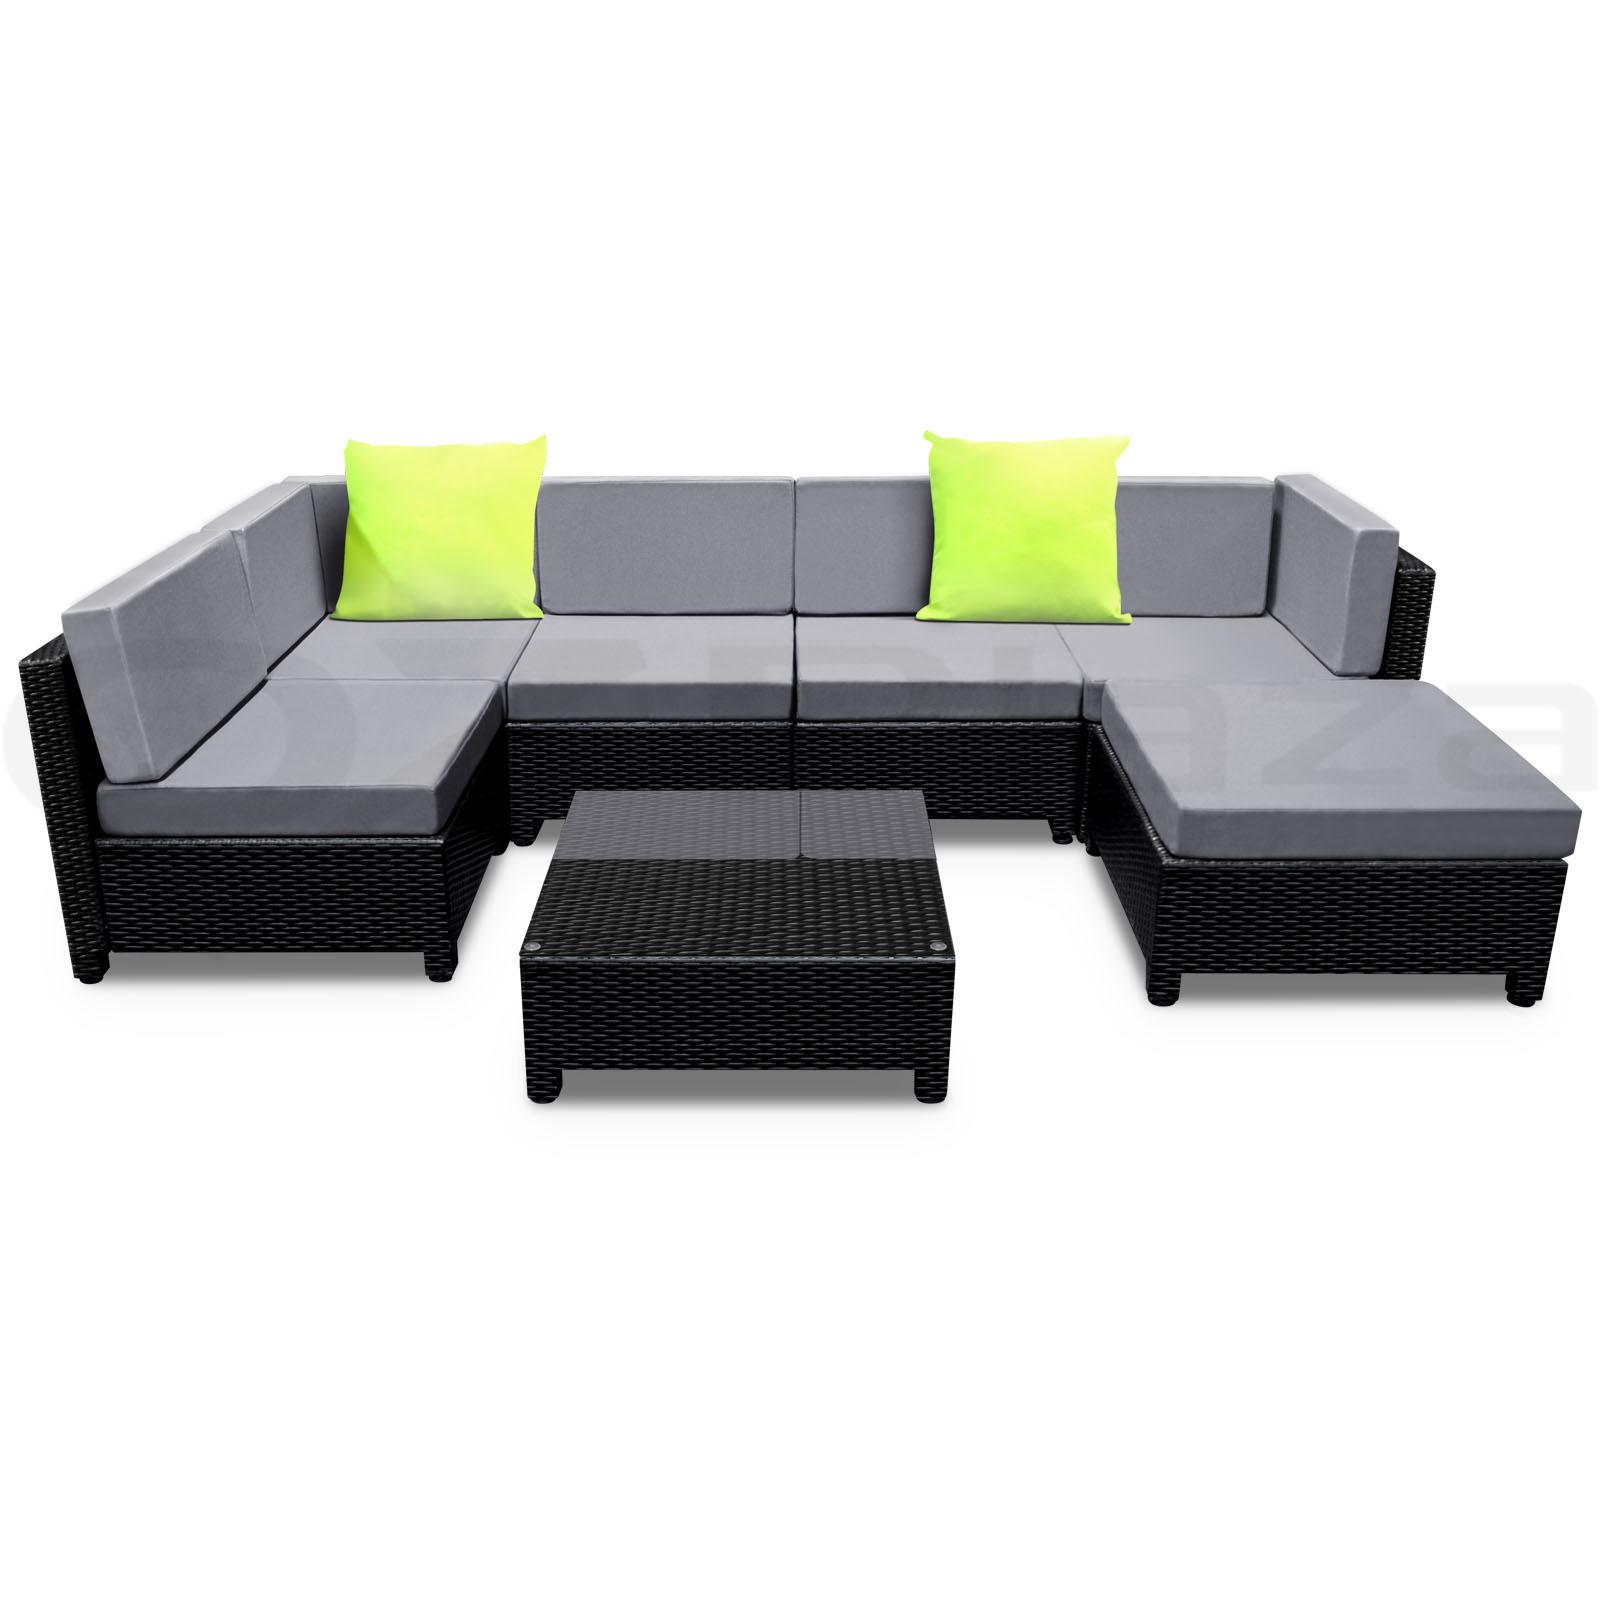 Outdoor Furniture Wicker 7pc PE Rattan SET Garden Lounge ...